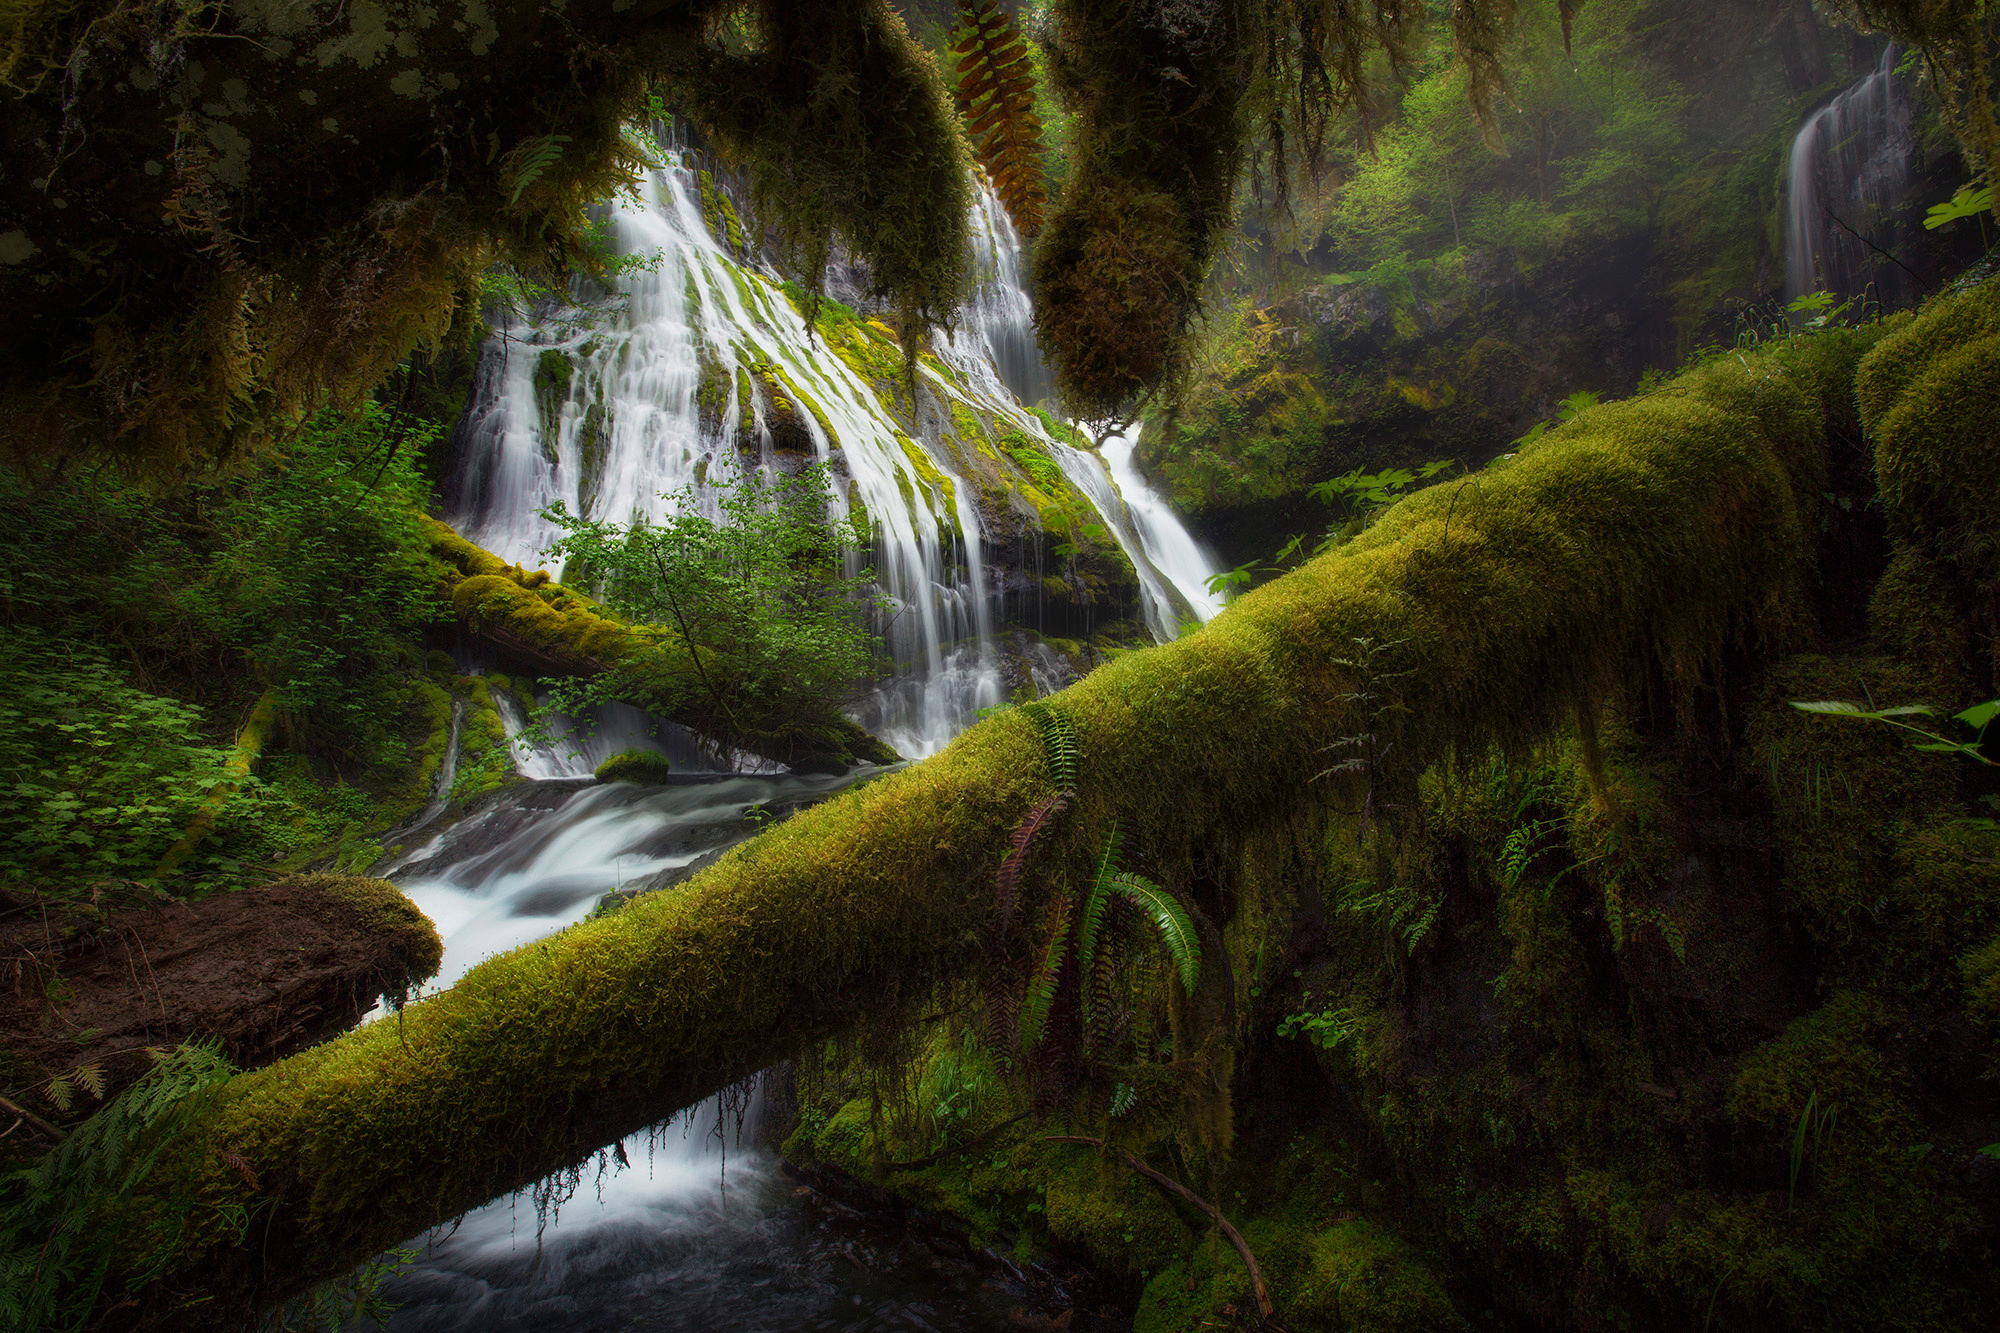 природа река водопад лес деревья nature river waterfall forest trees  № 484102 загрузить